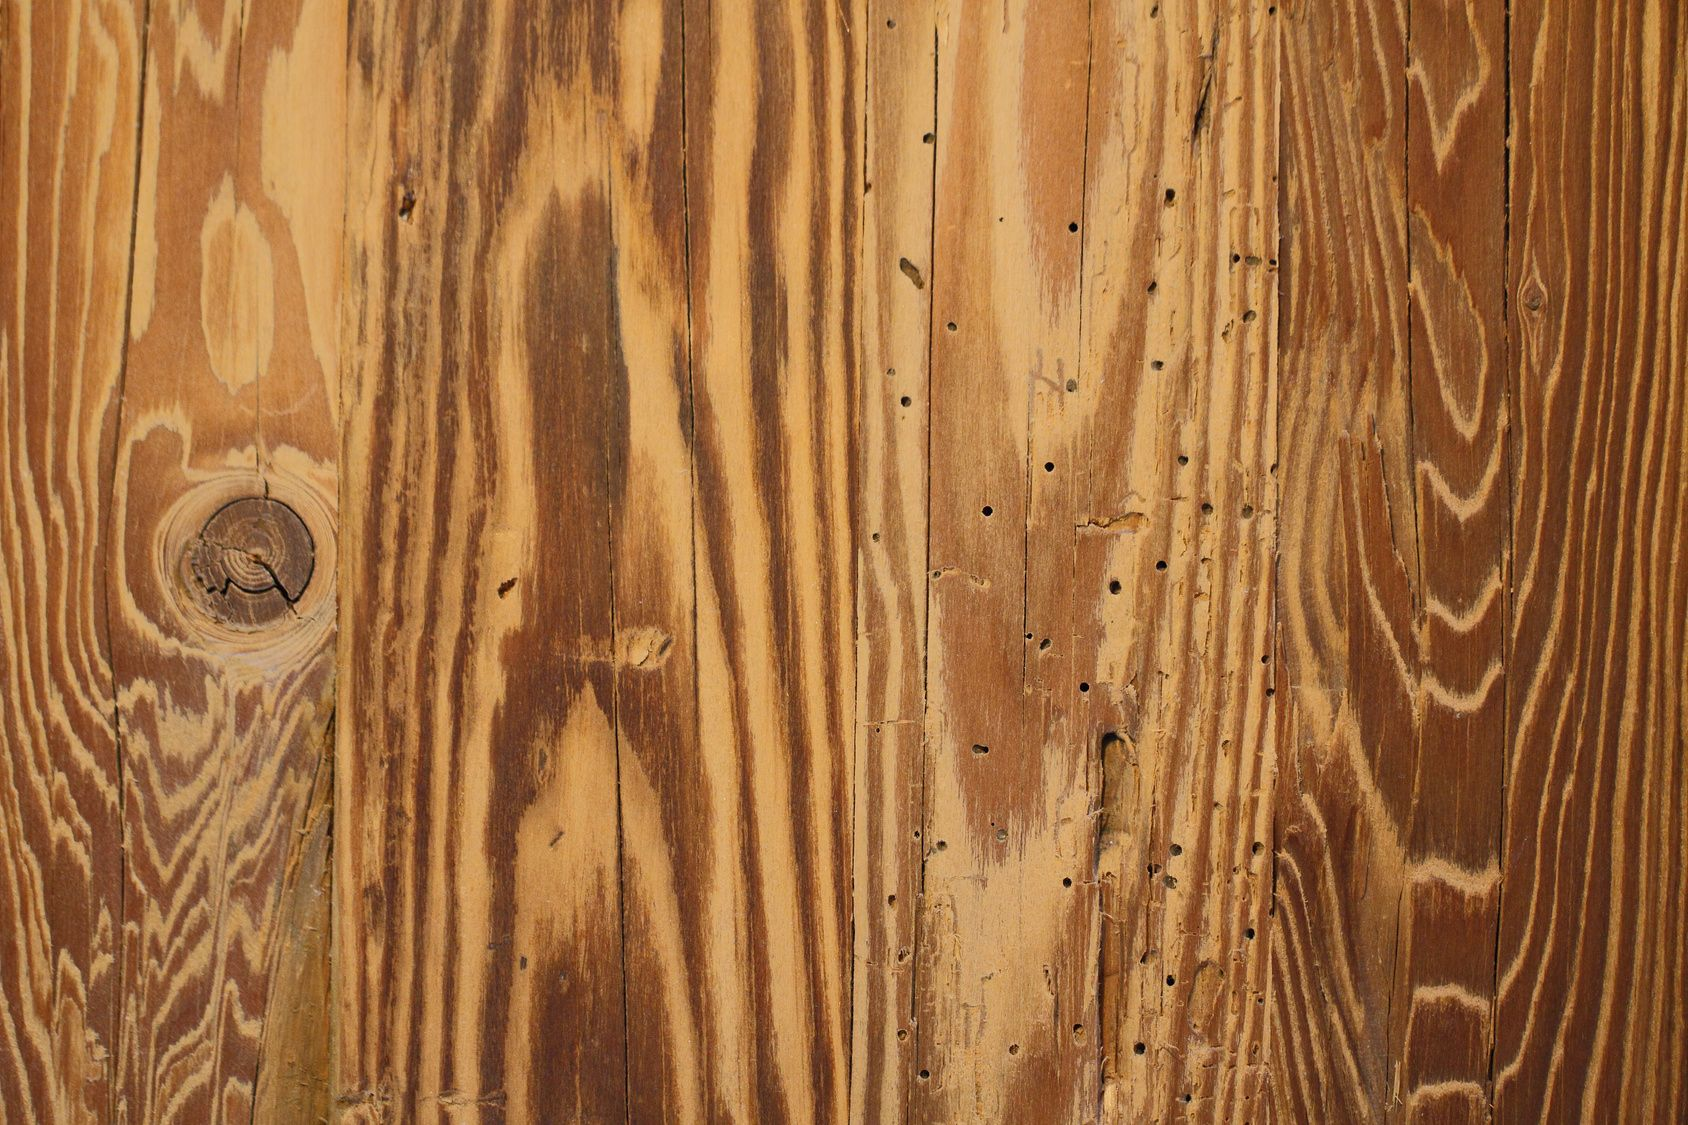 Holzwurm In Mobeln Bekampfen Frag Mutti Holzwurm Holzwurmer Bekampfen Holz